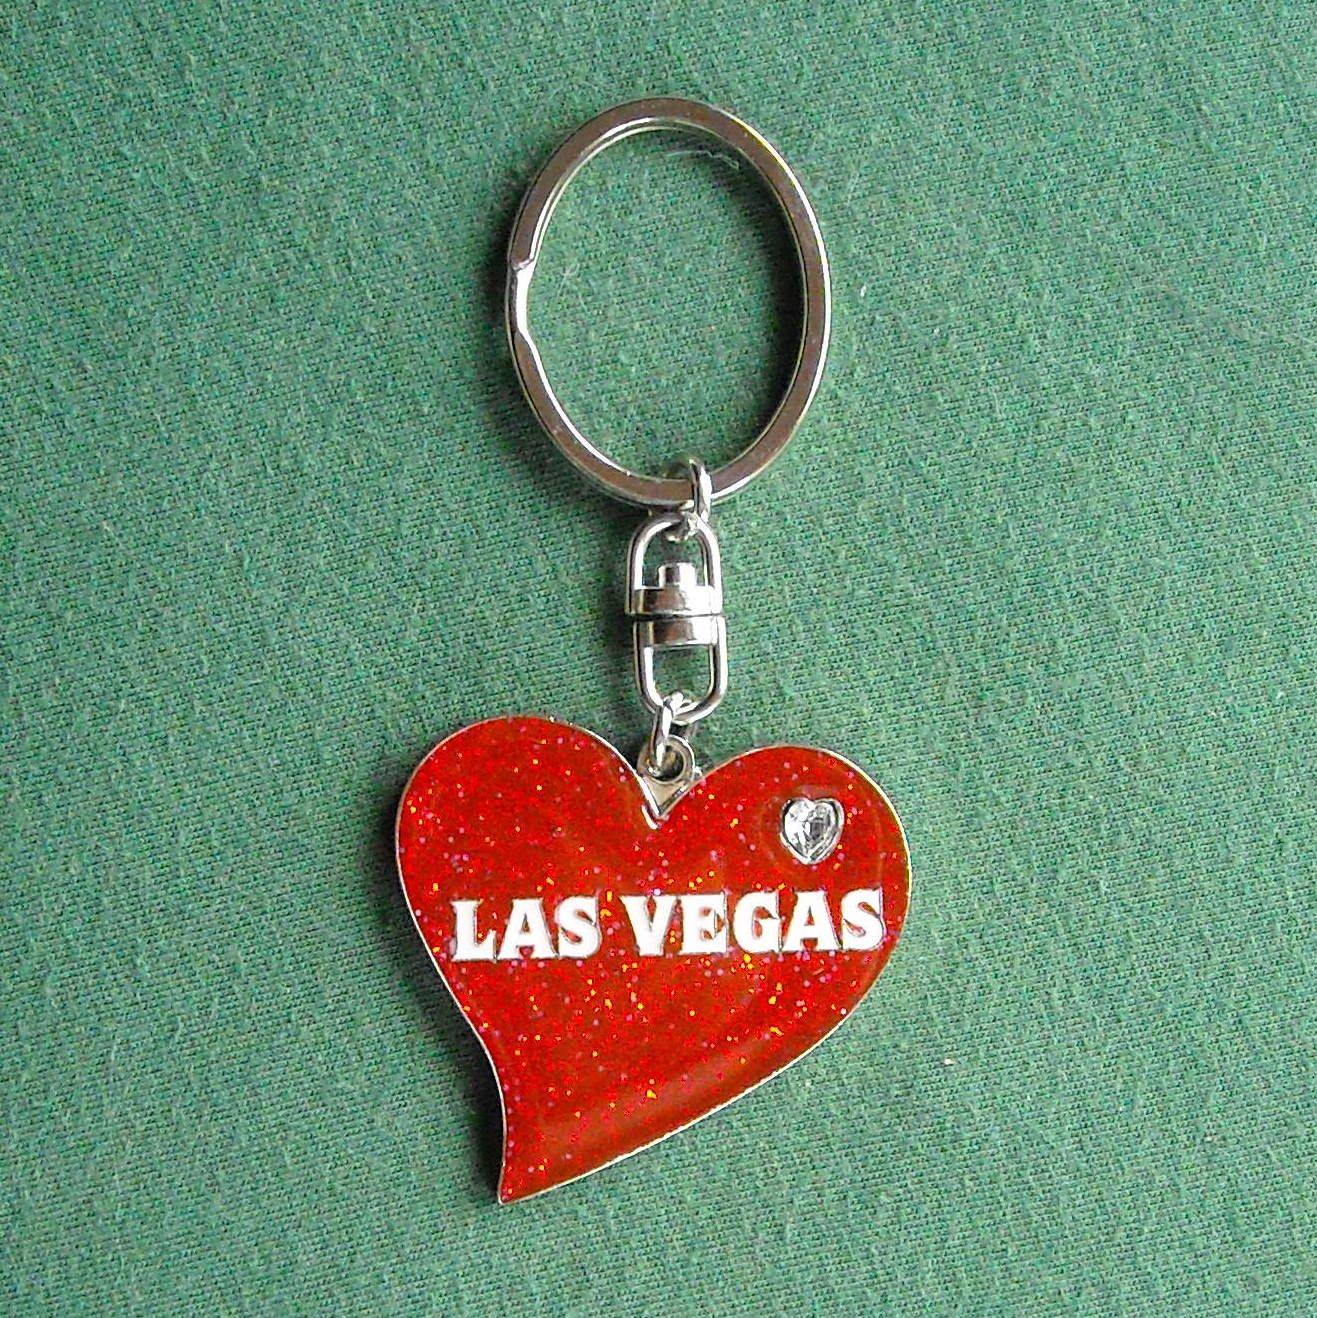 Love Las Vegas heart enamel key ring chain